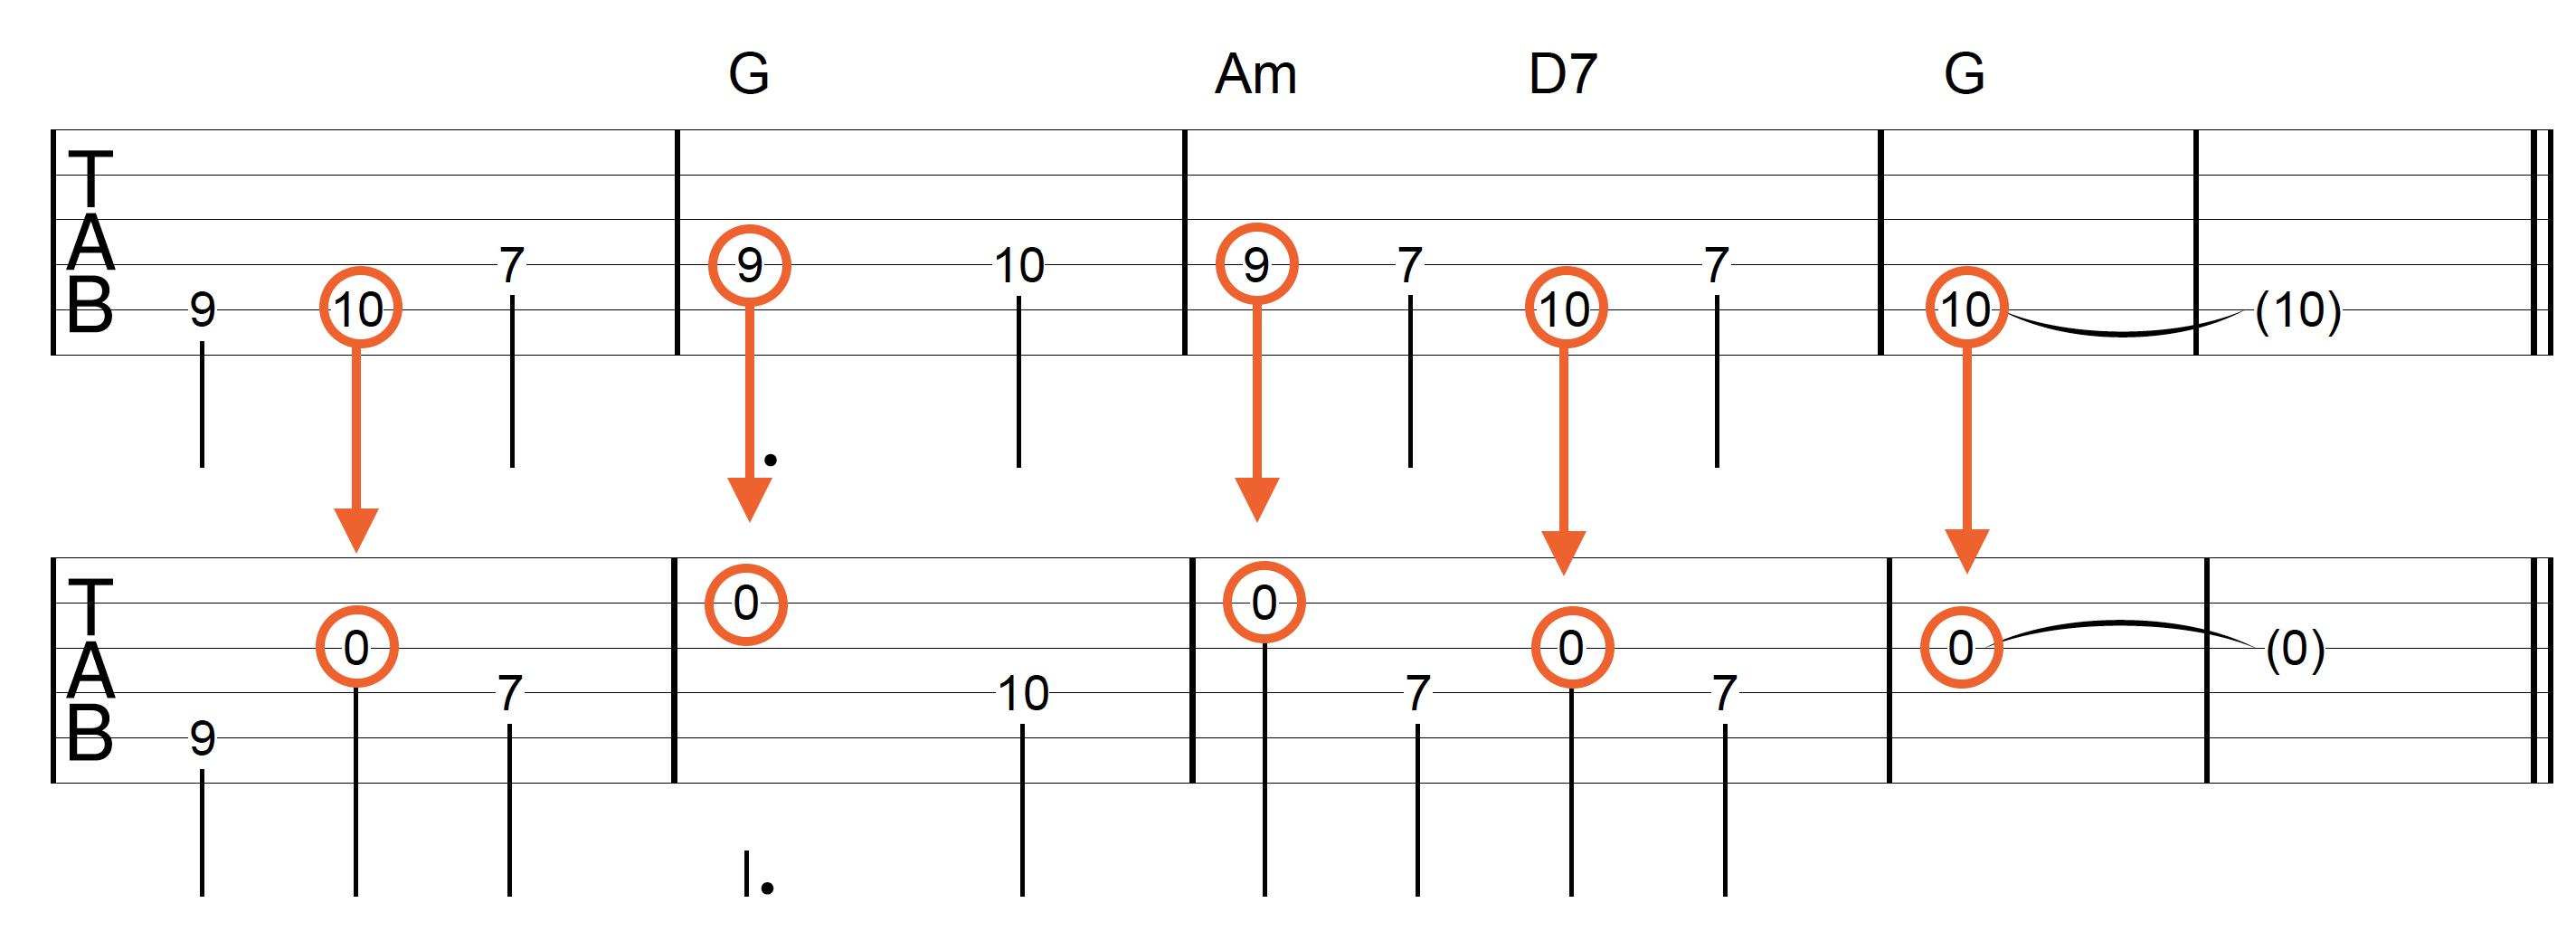 Open String Melody Danny Boy Conversion 4